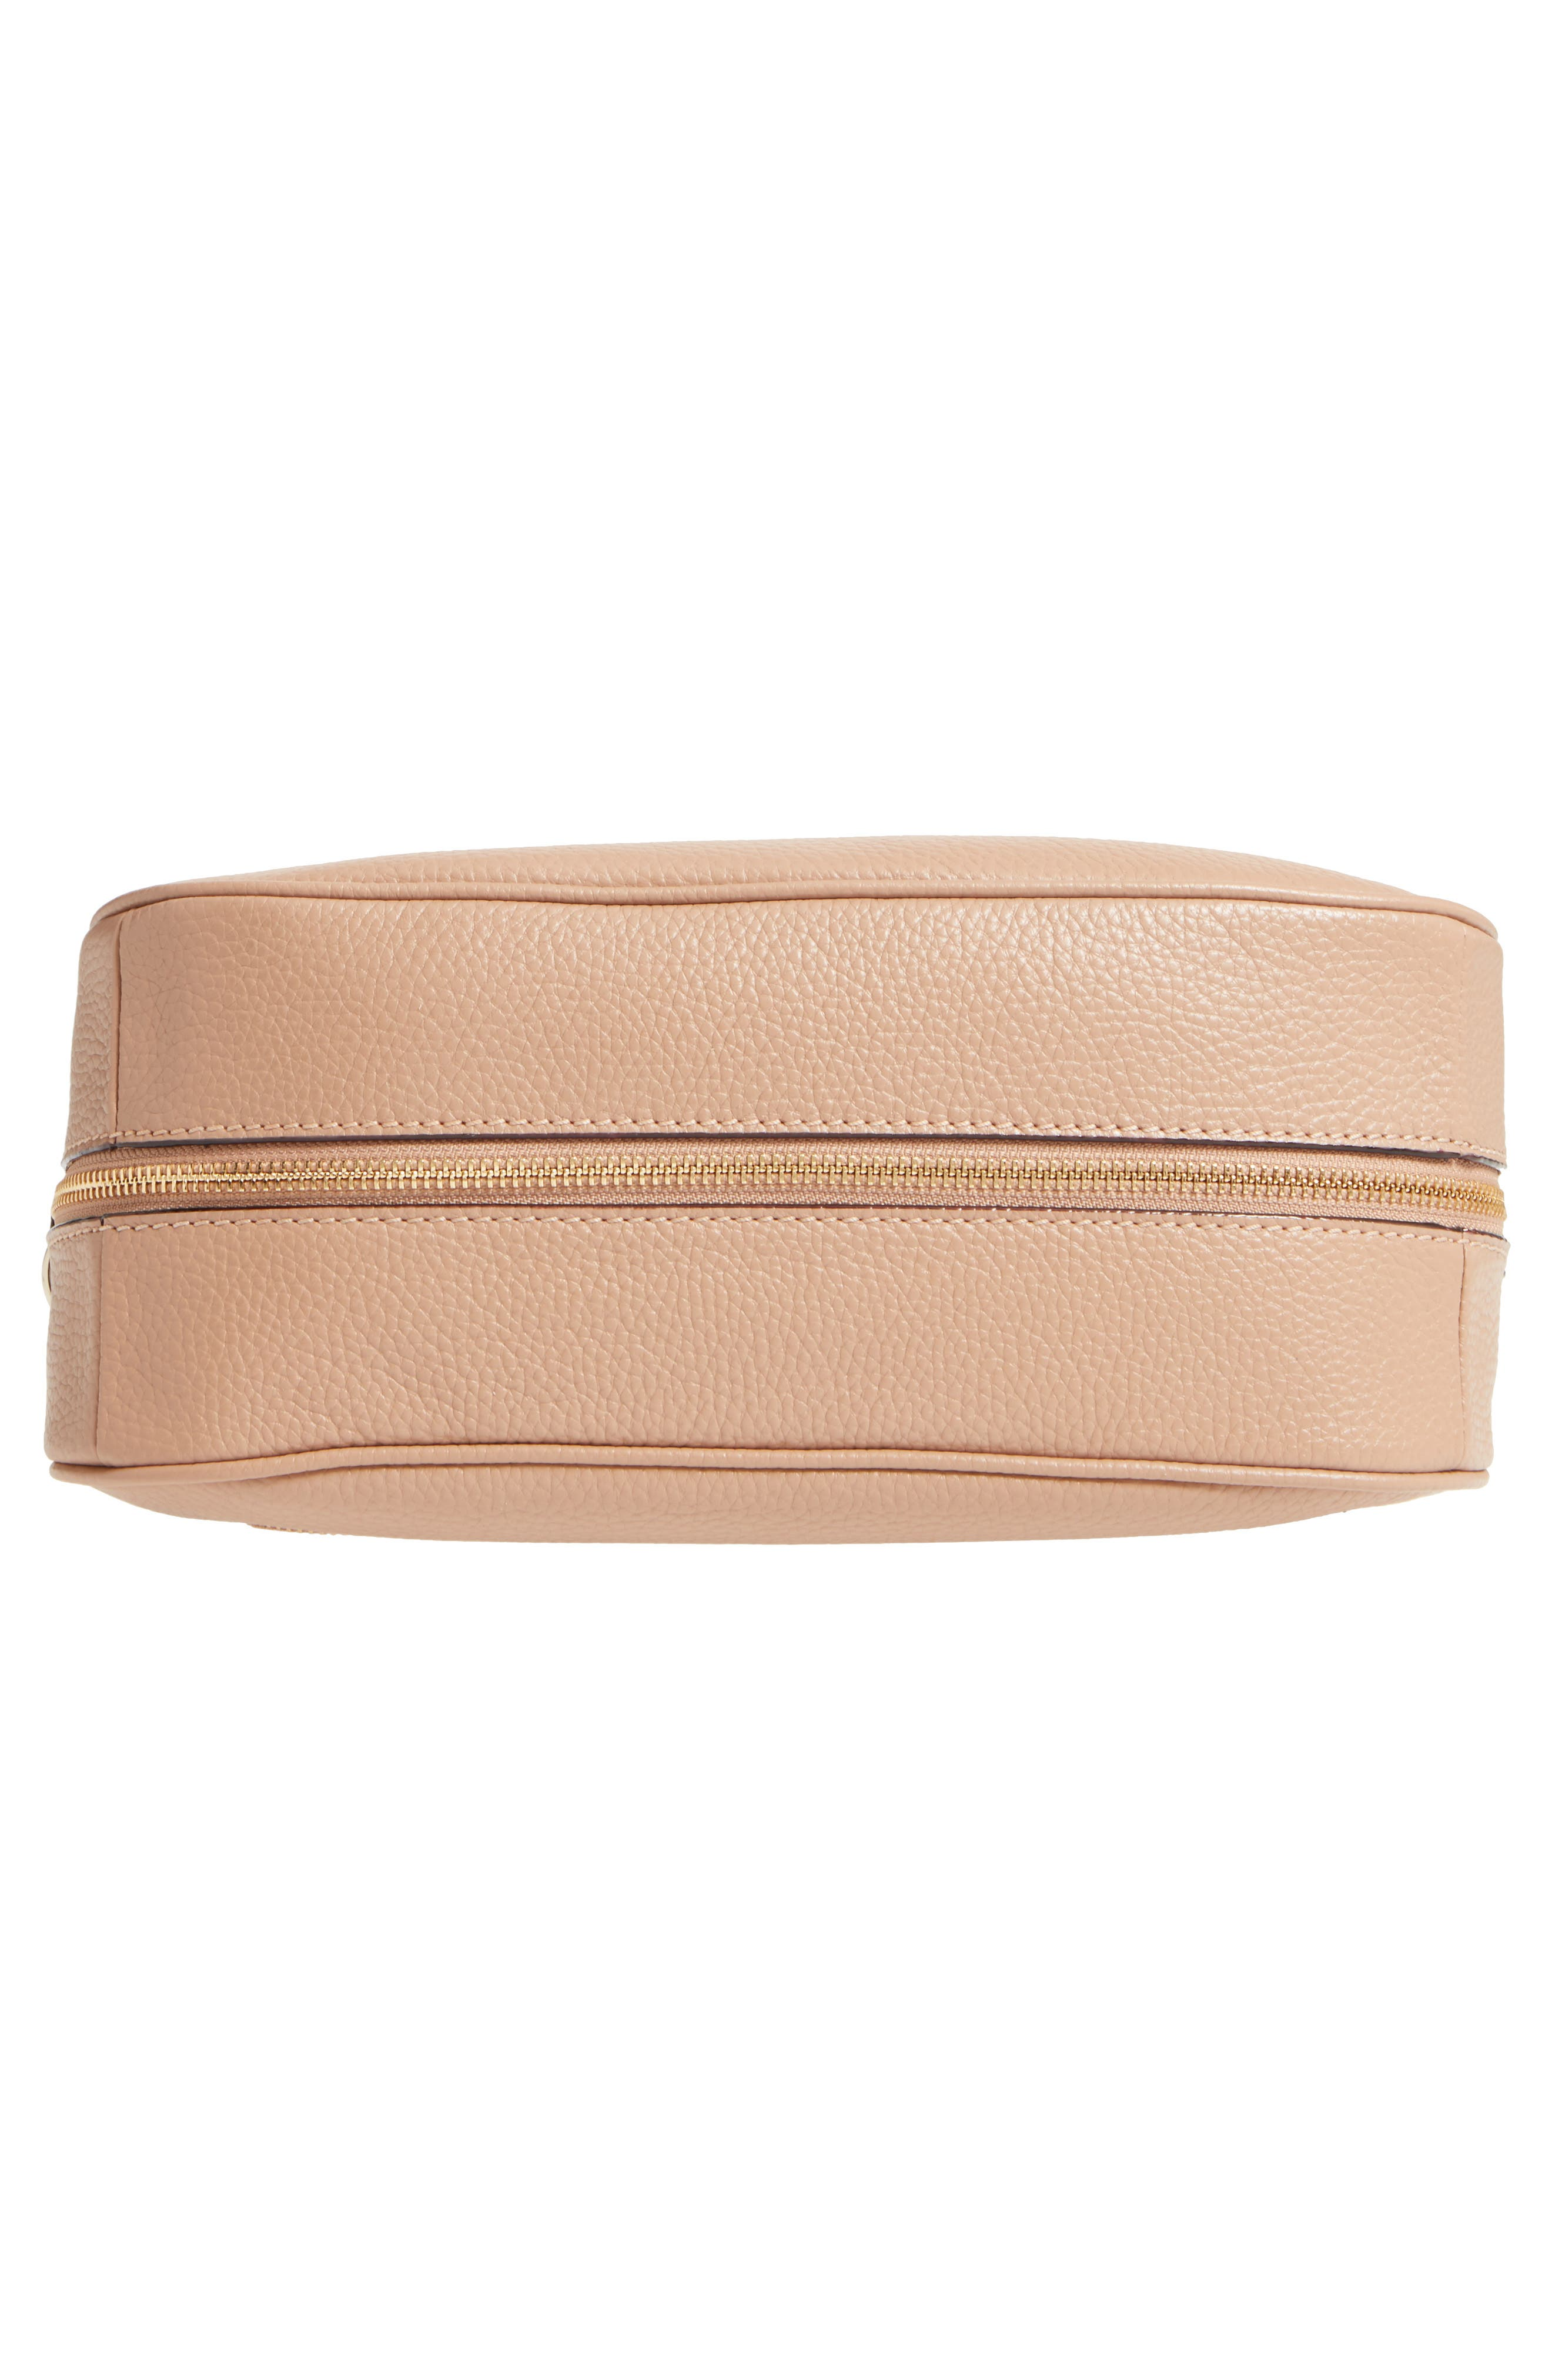 cobble hill - deva leather crossbody bag,                             Alternate thumbnail 39, color,